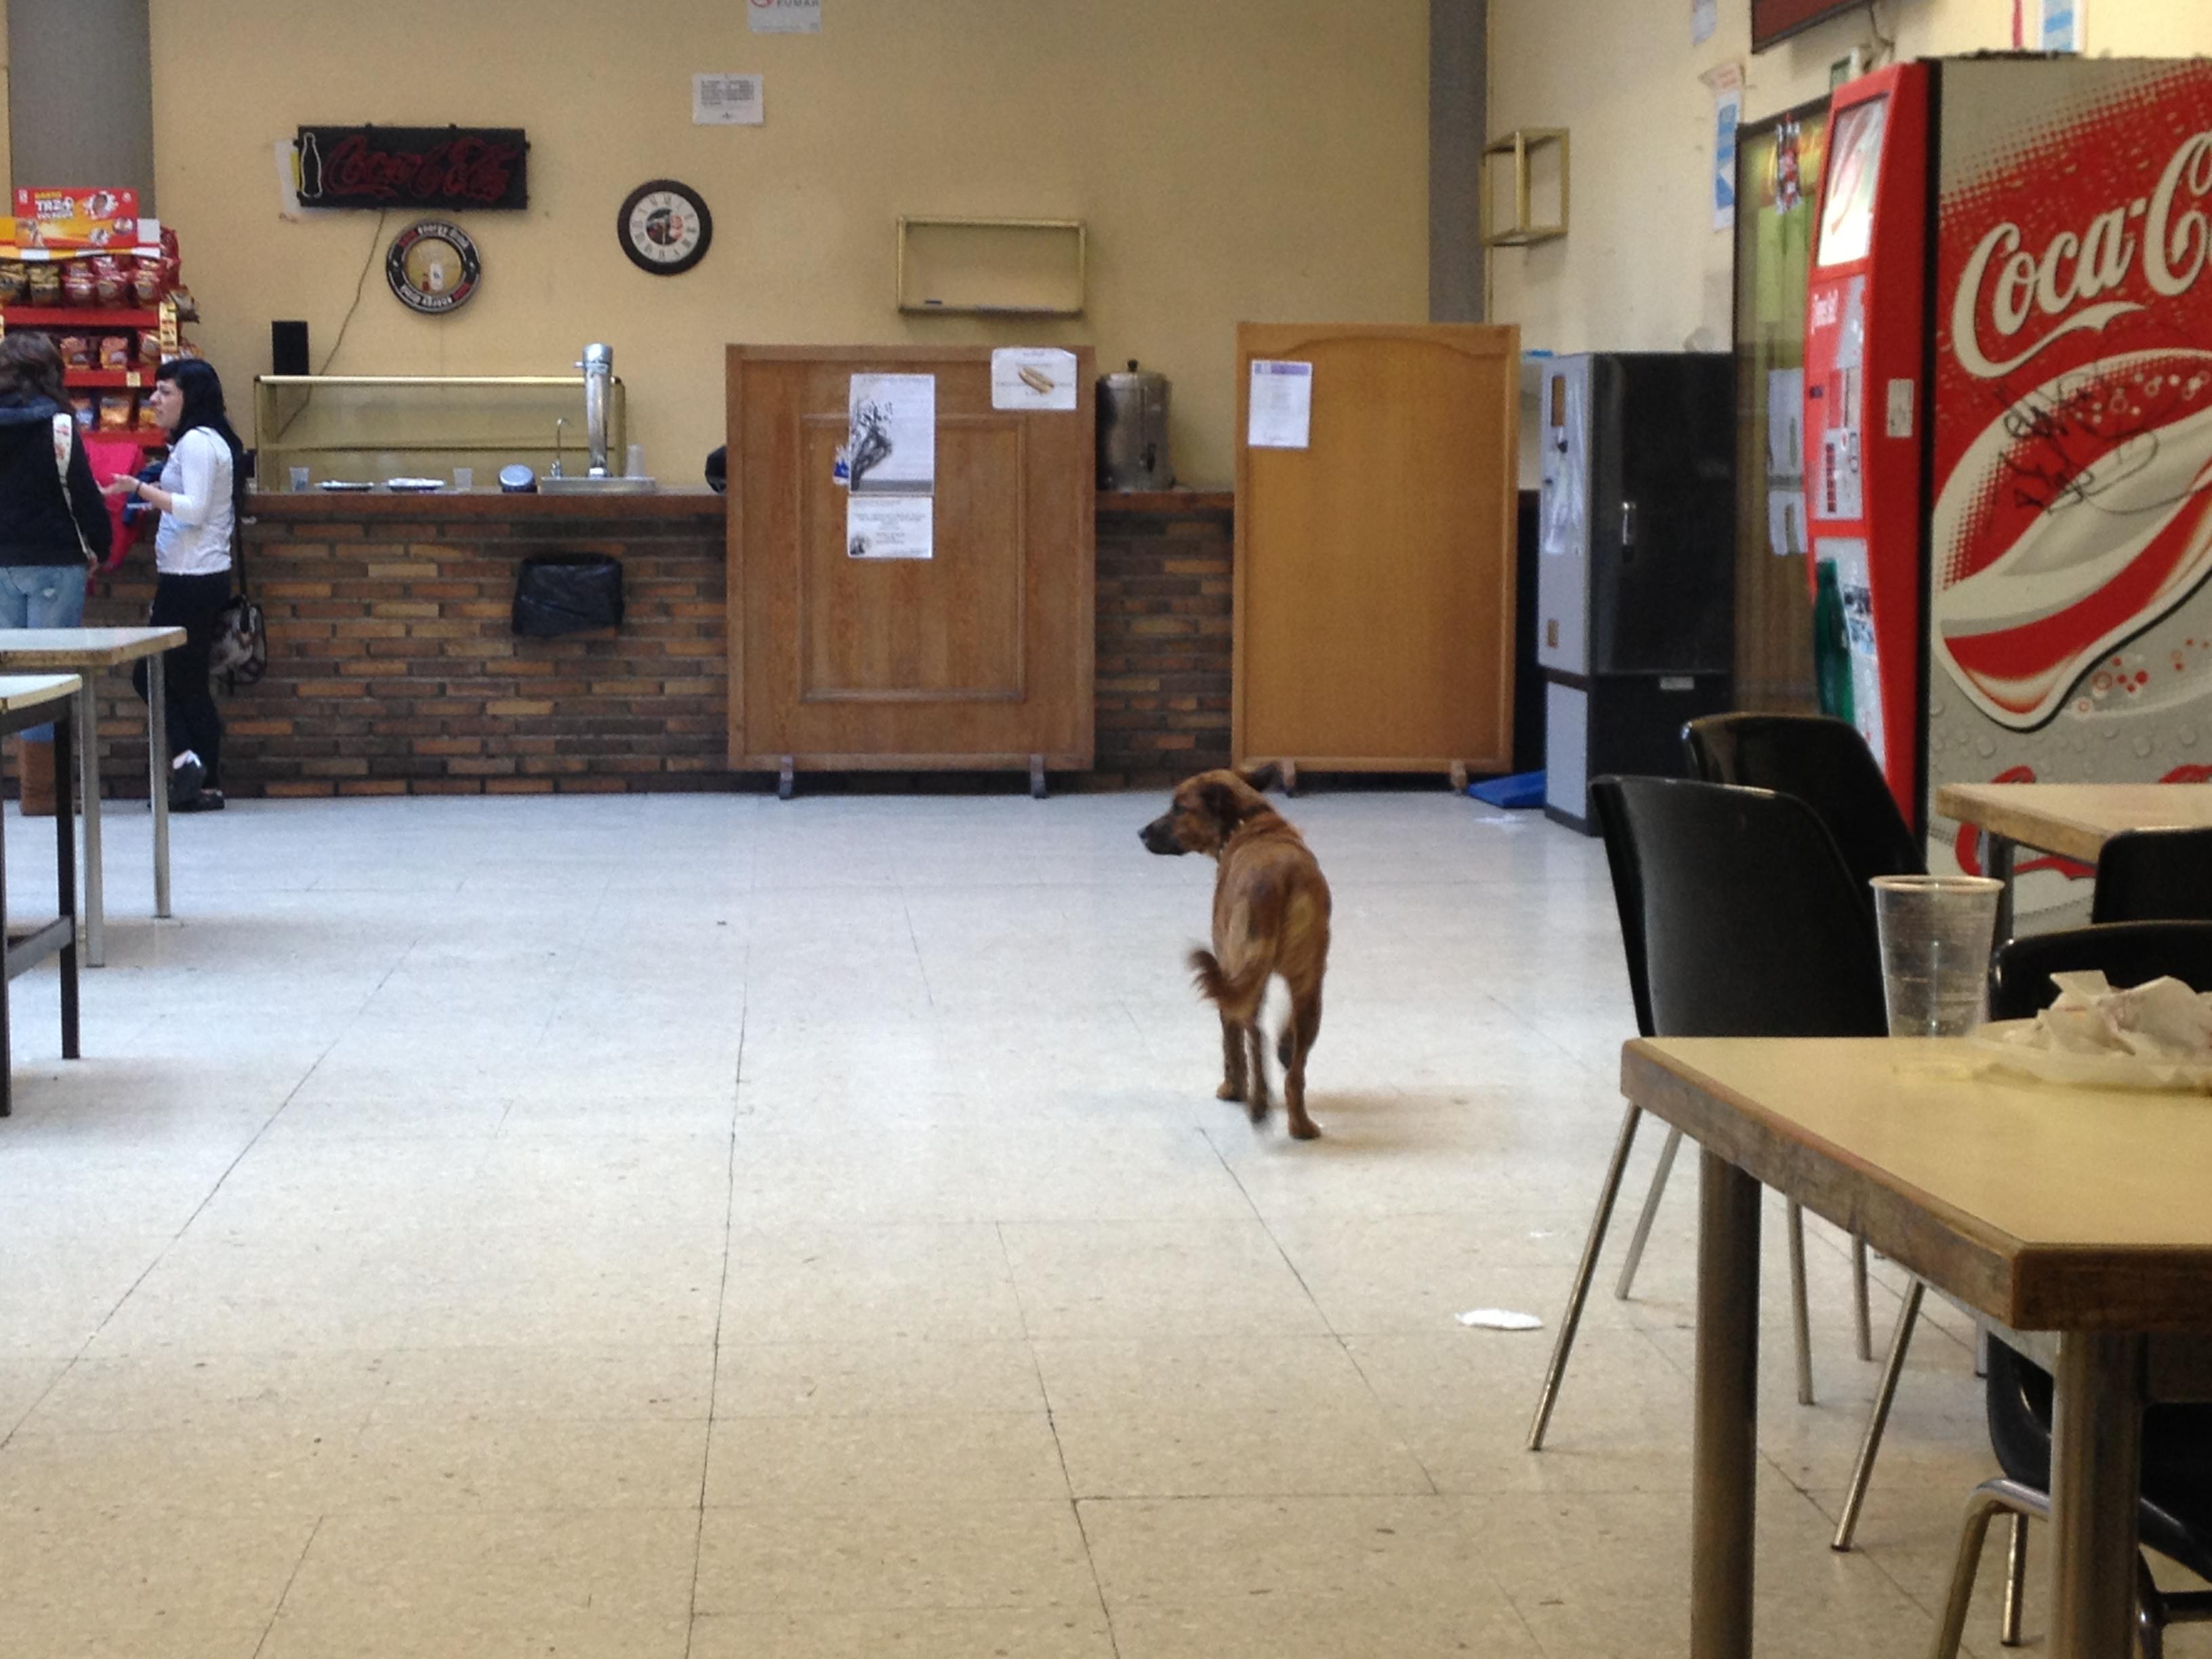 2013-03-06-Dogcafeteria.jpg